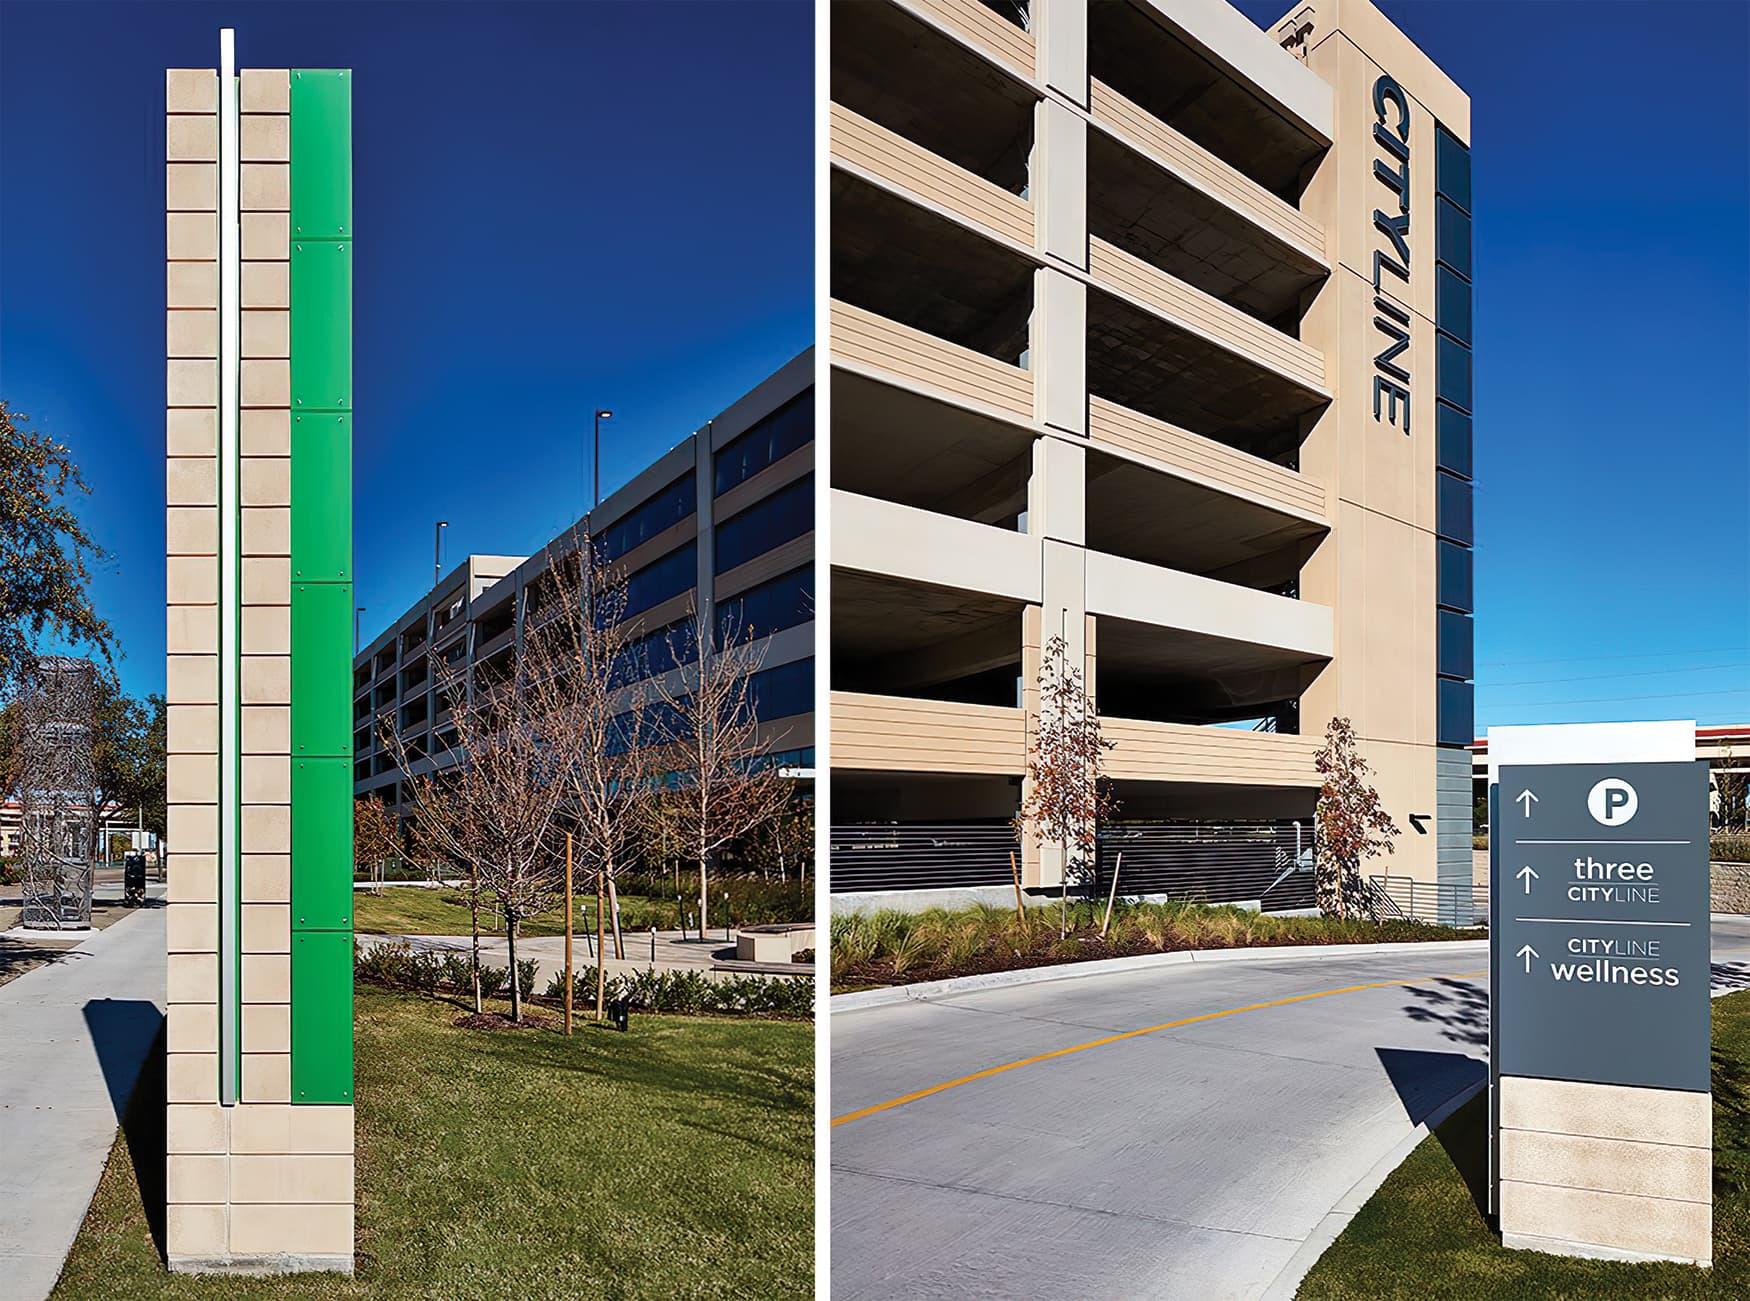 CityLine a mixed-use development in Dallas, Texas. Identity and wayfinding design. Vehicular Wayfinding Design.